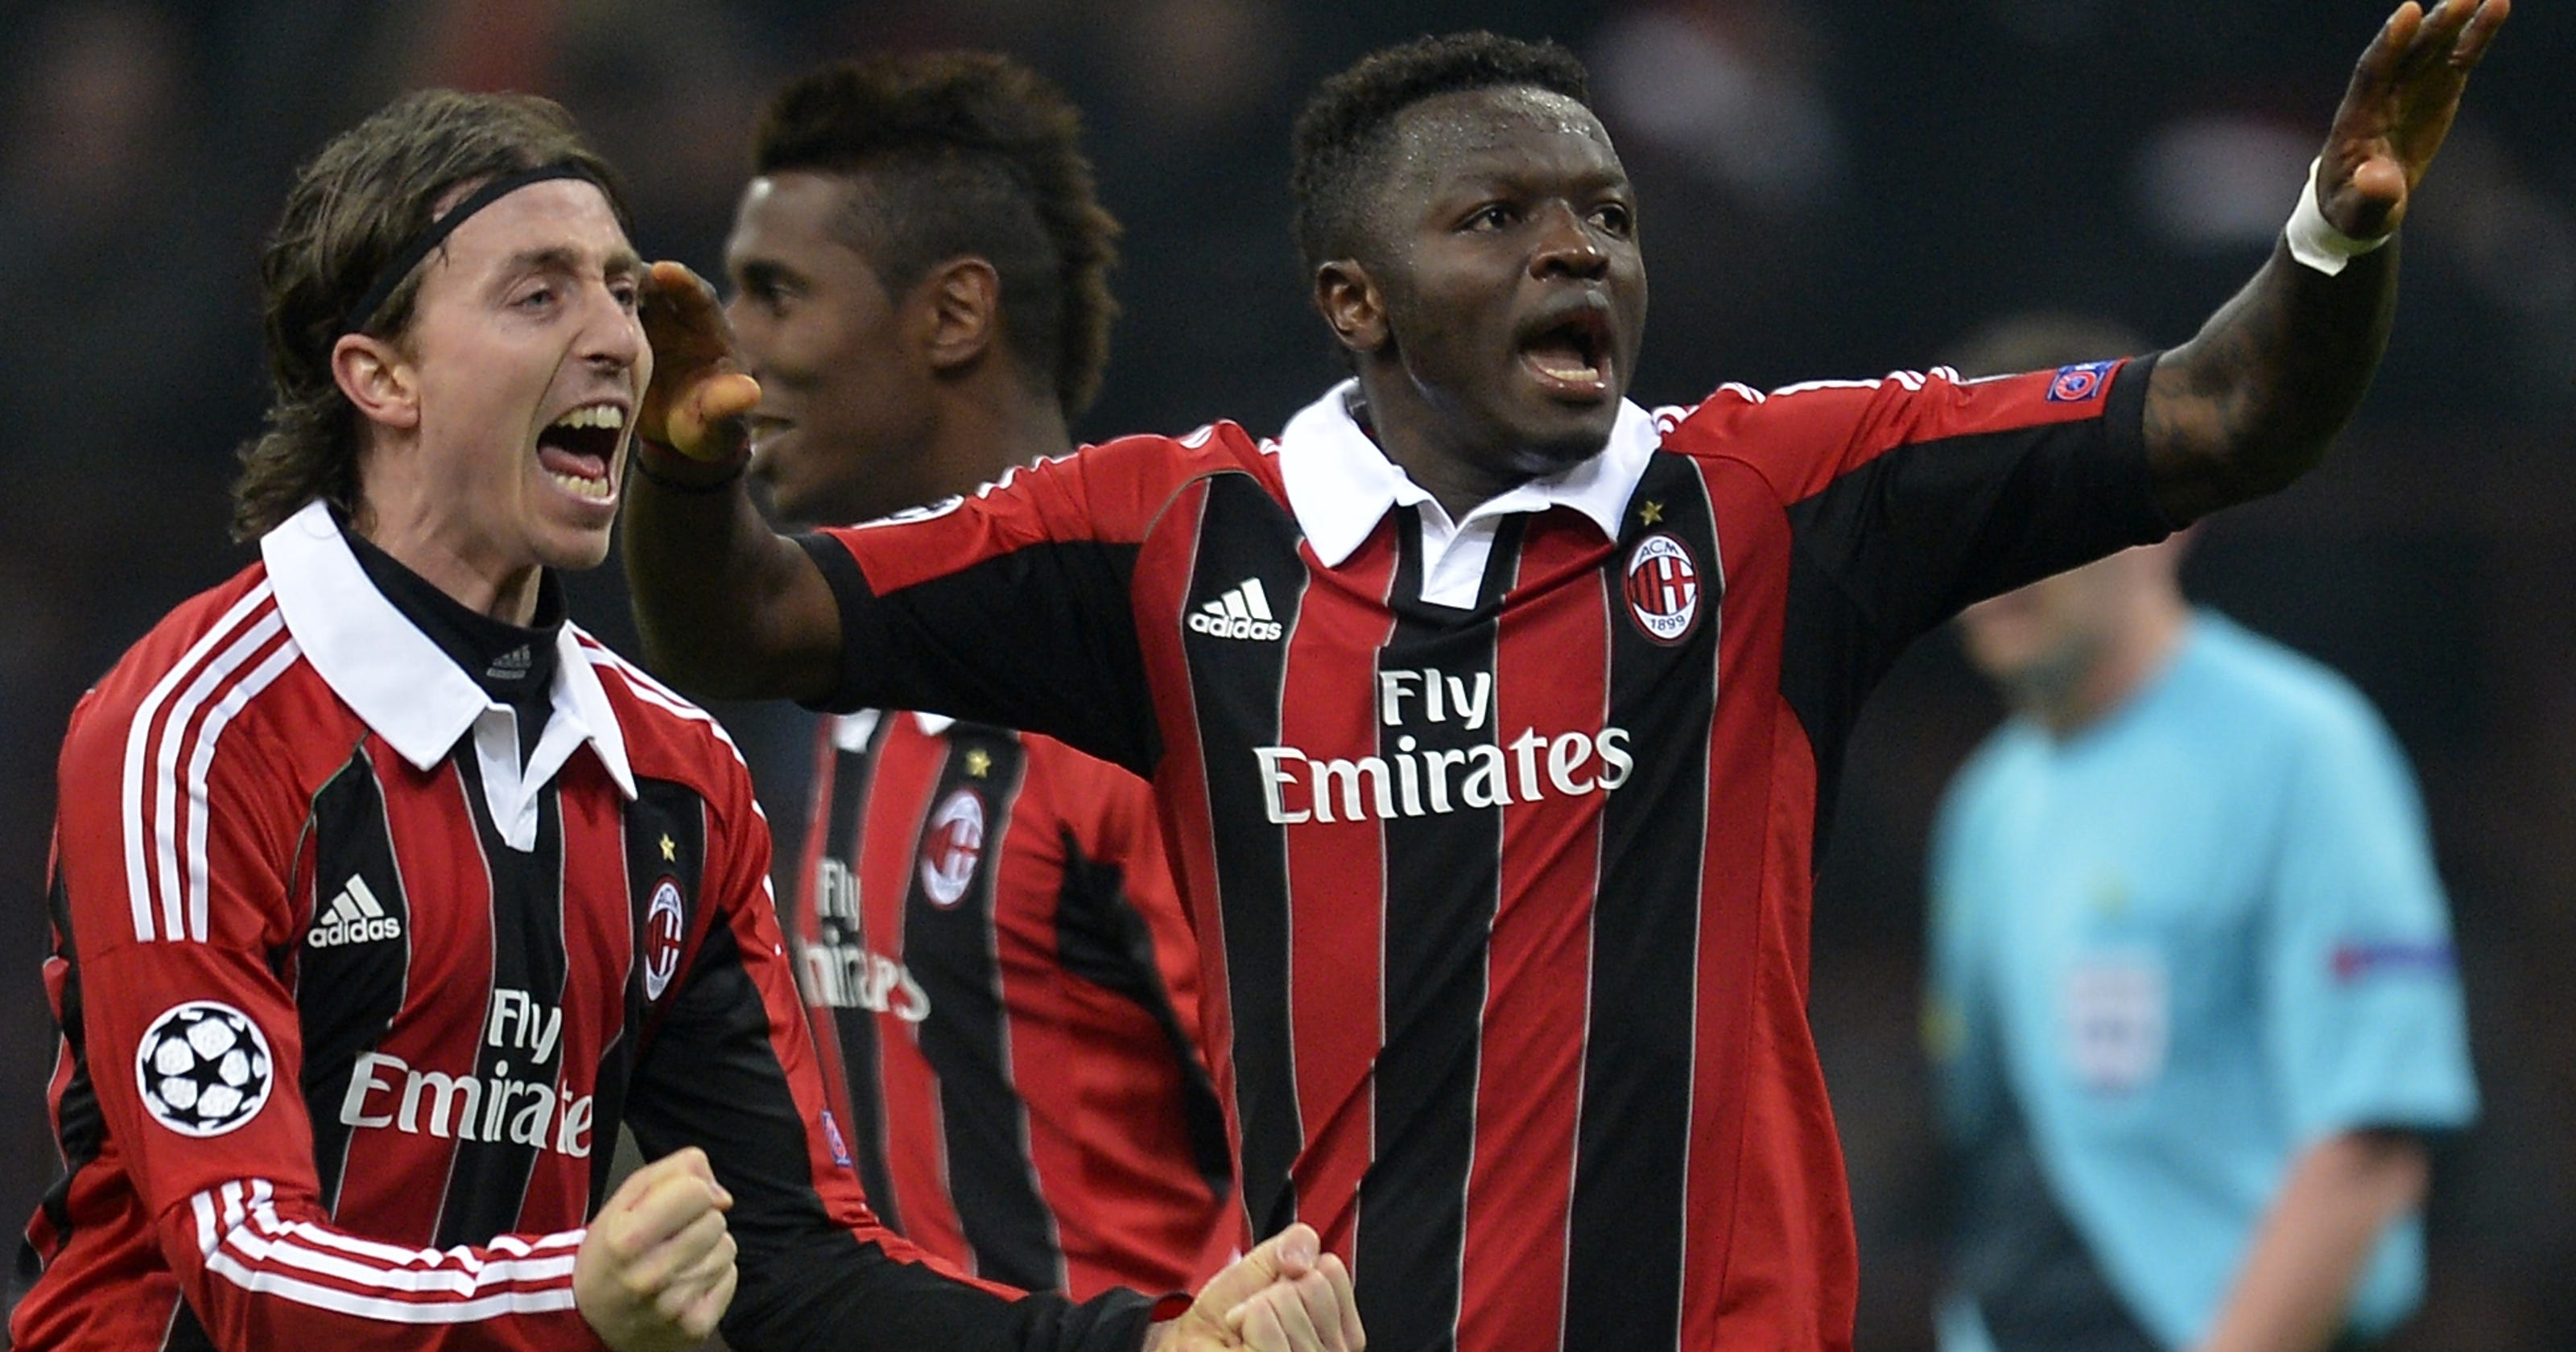 a236a8fdabc3f AC Milan stuns Barcelona 2-0 in Champions League